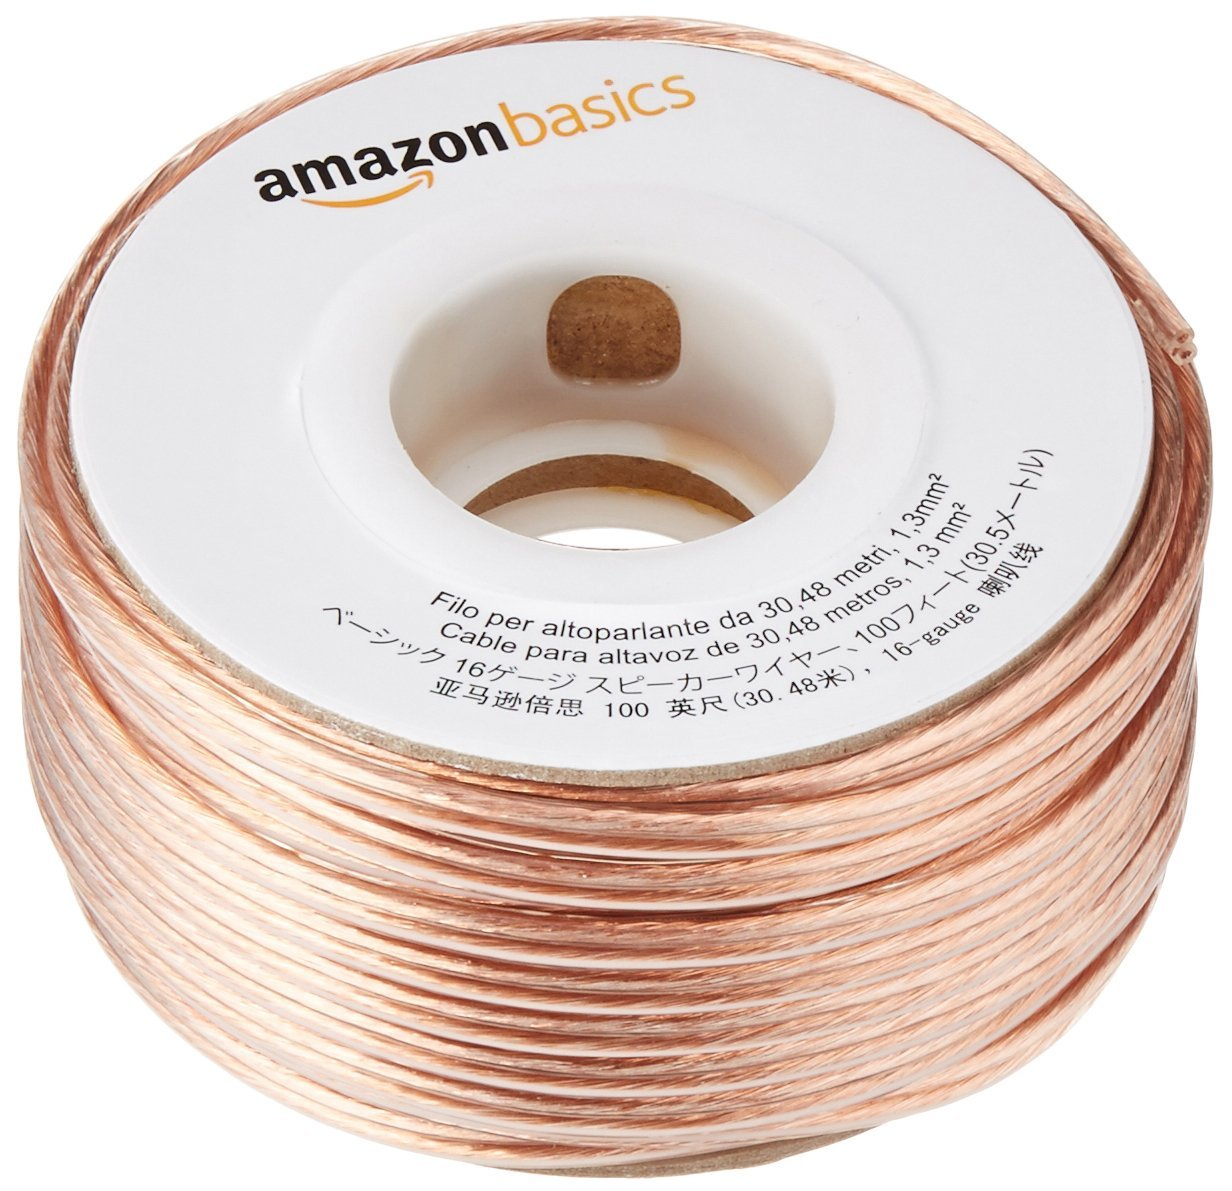 AmazonBasics 9-Gauge Speaker Wire - 9 Feet